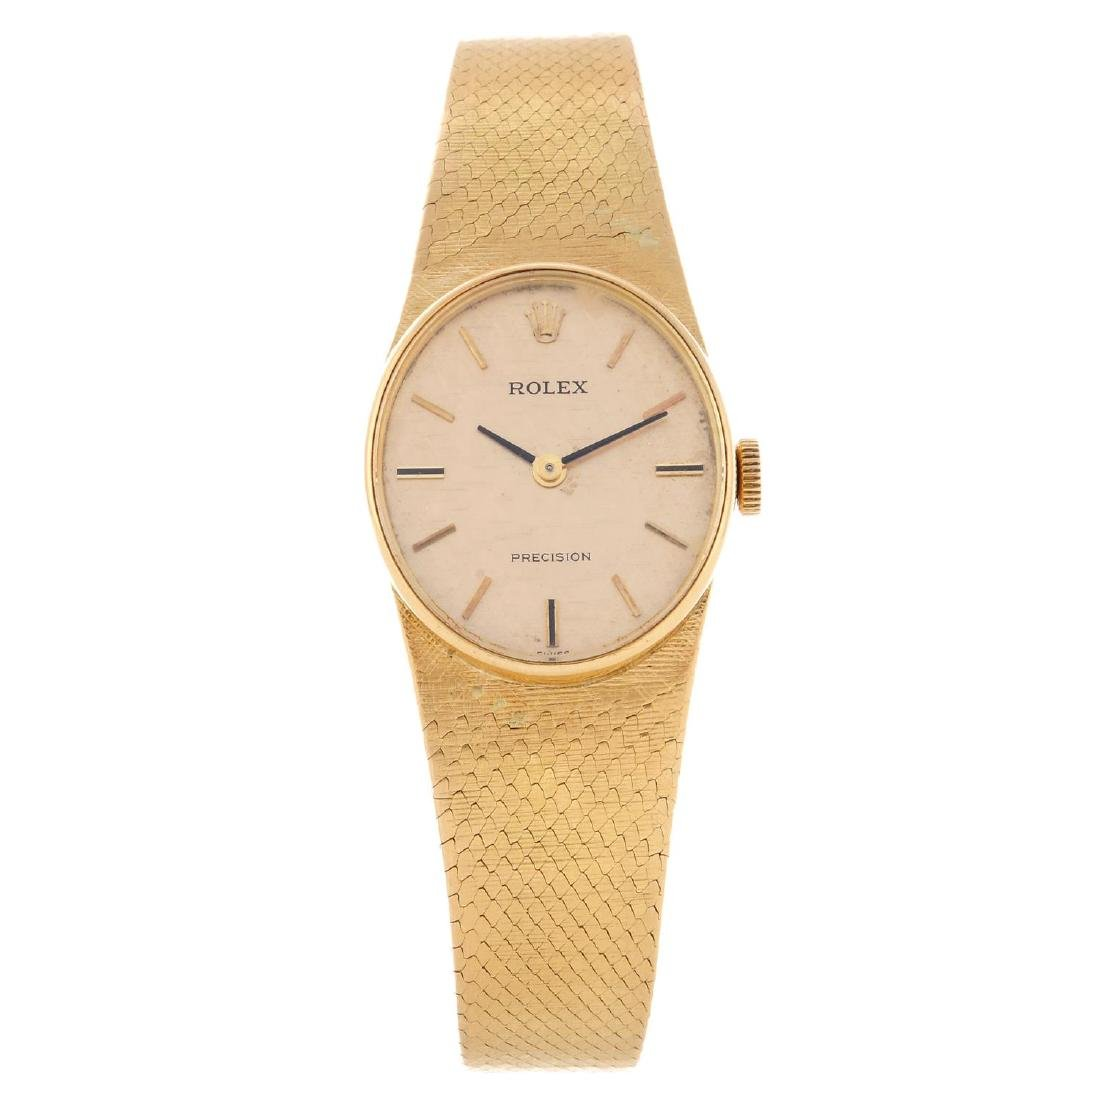 ROLEX - a lady's Precision bracelet watch. Yellow metal